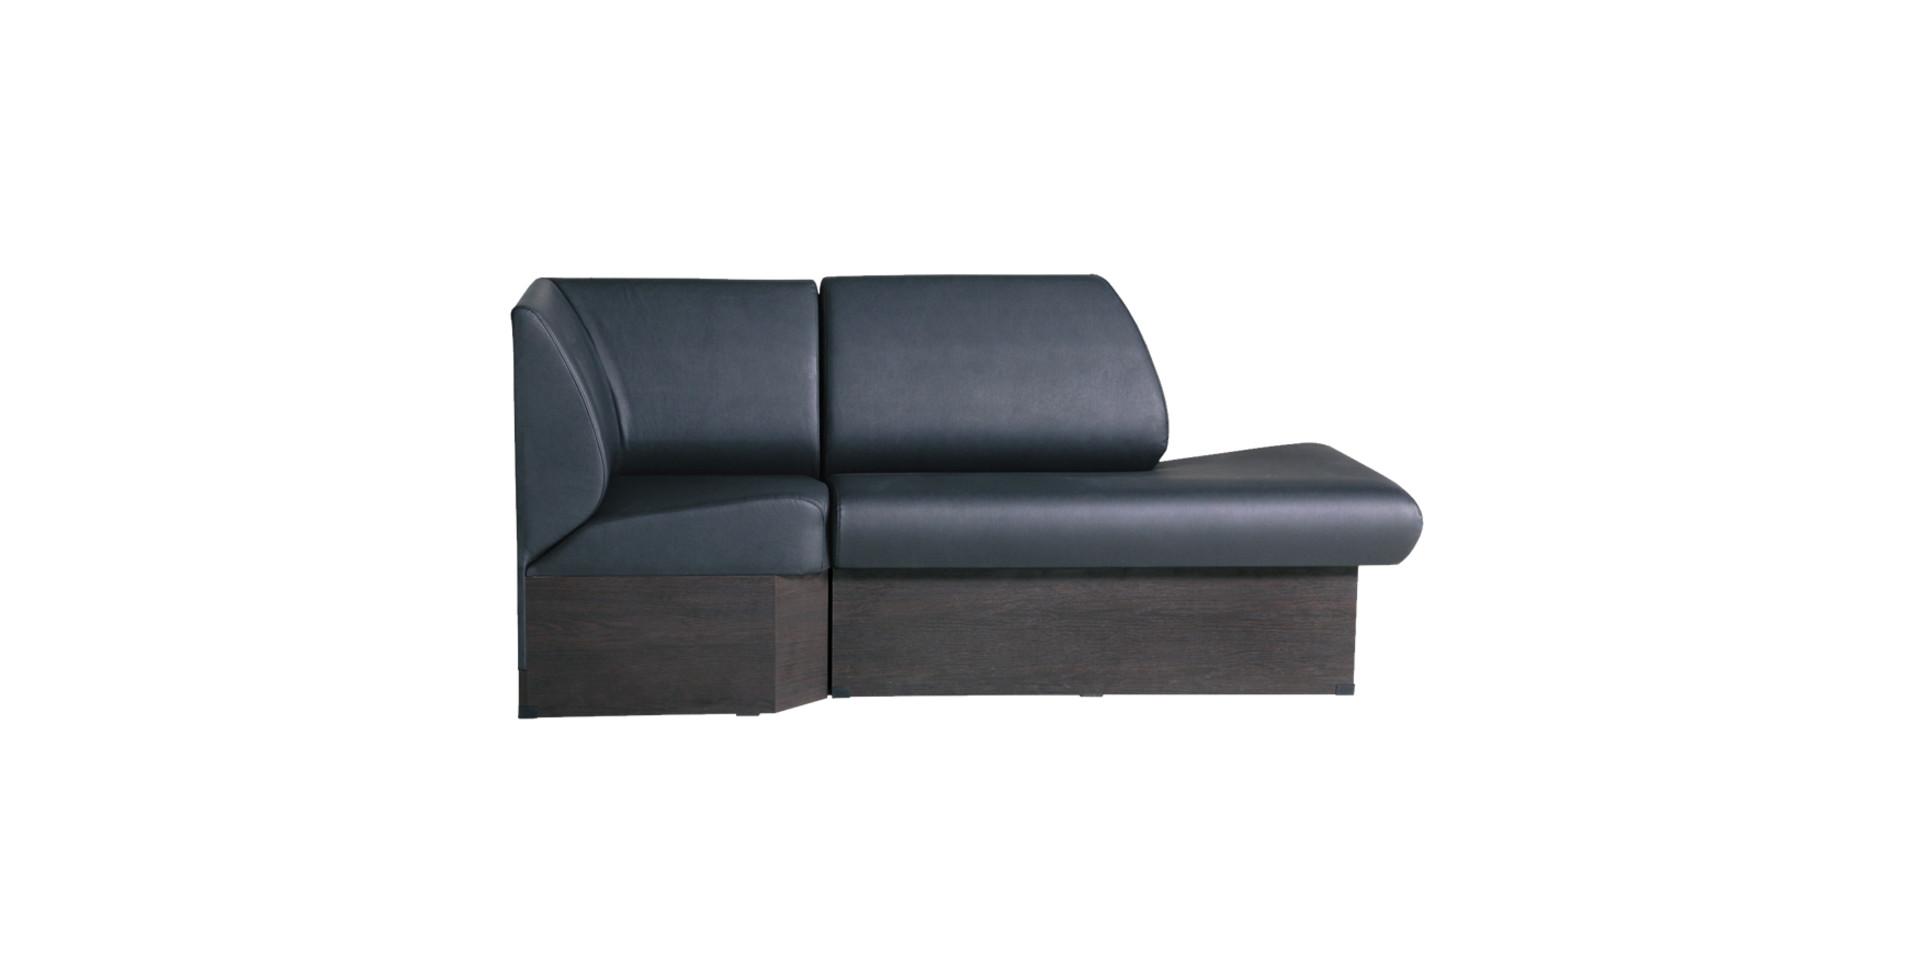 sits-brita-angle-corner90_bench_oasi_black_1